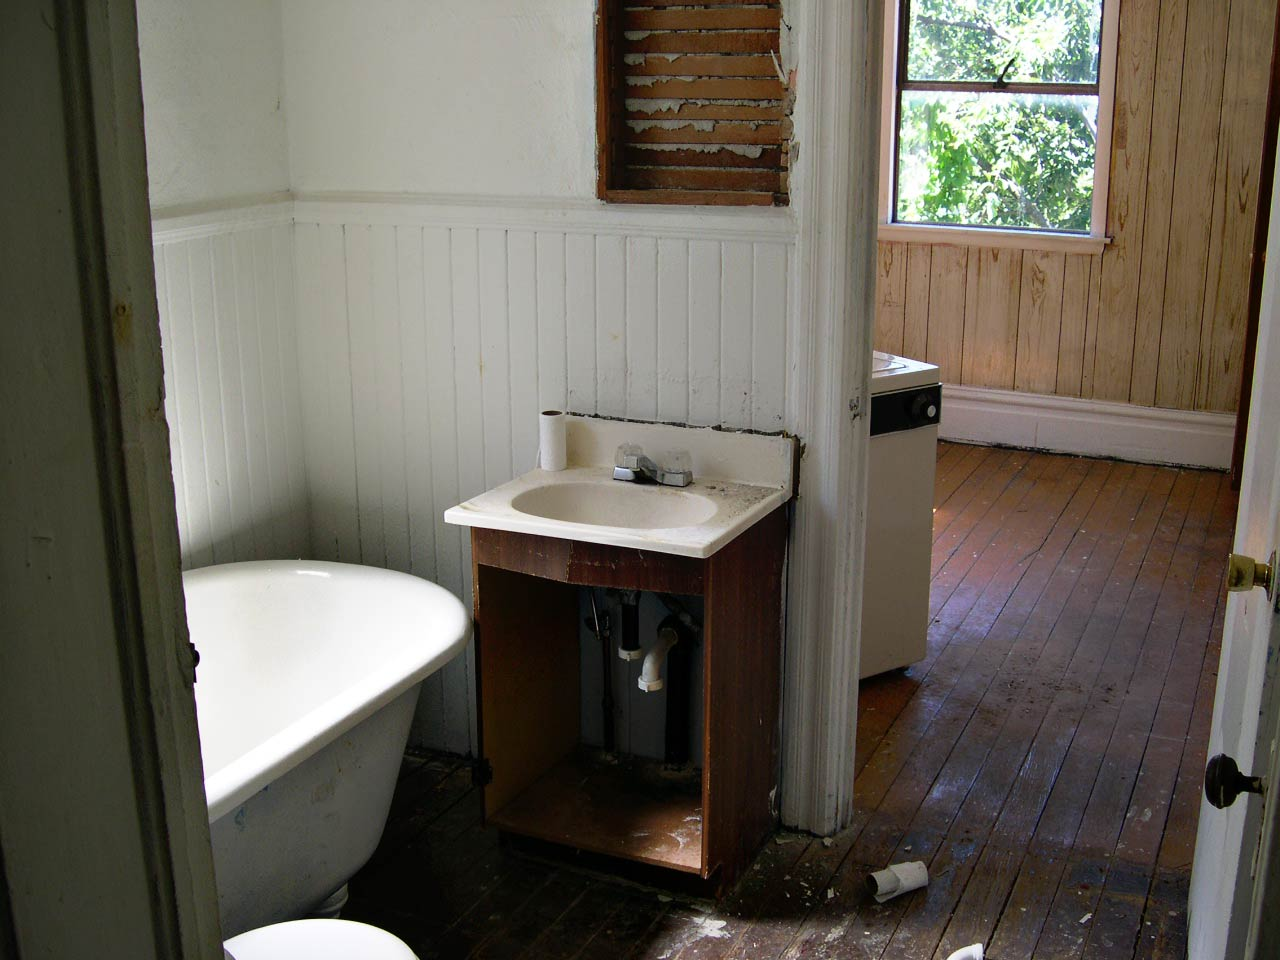 Clark Watson Home Remodel - Bathroom Before